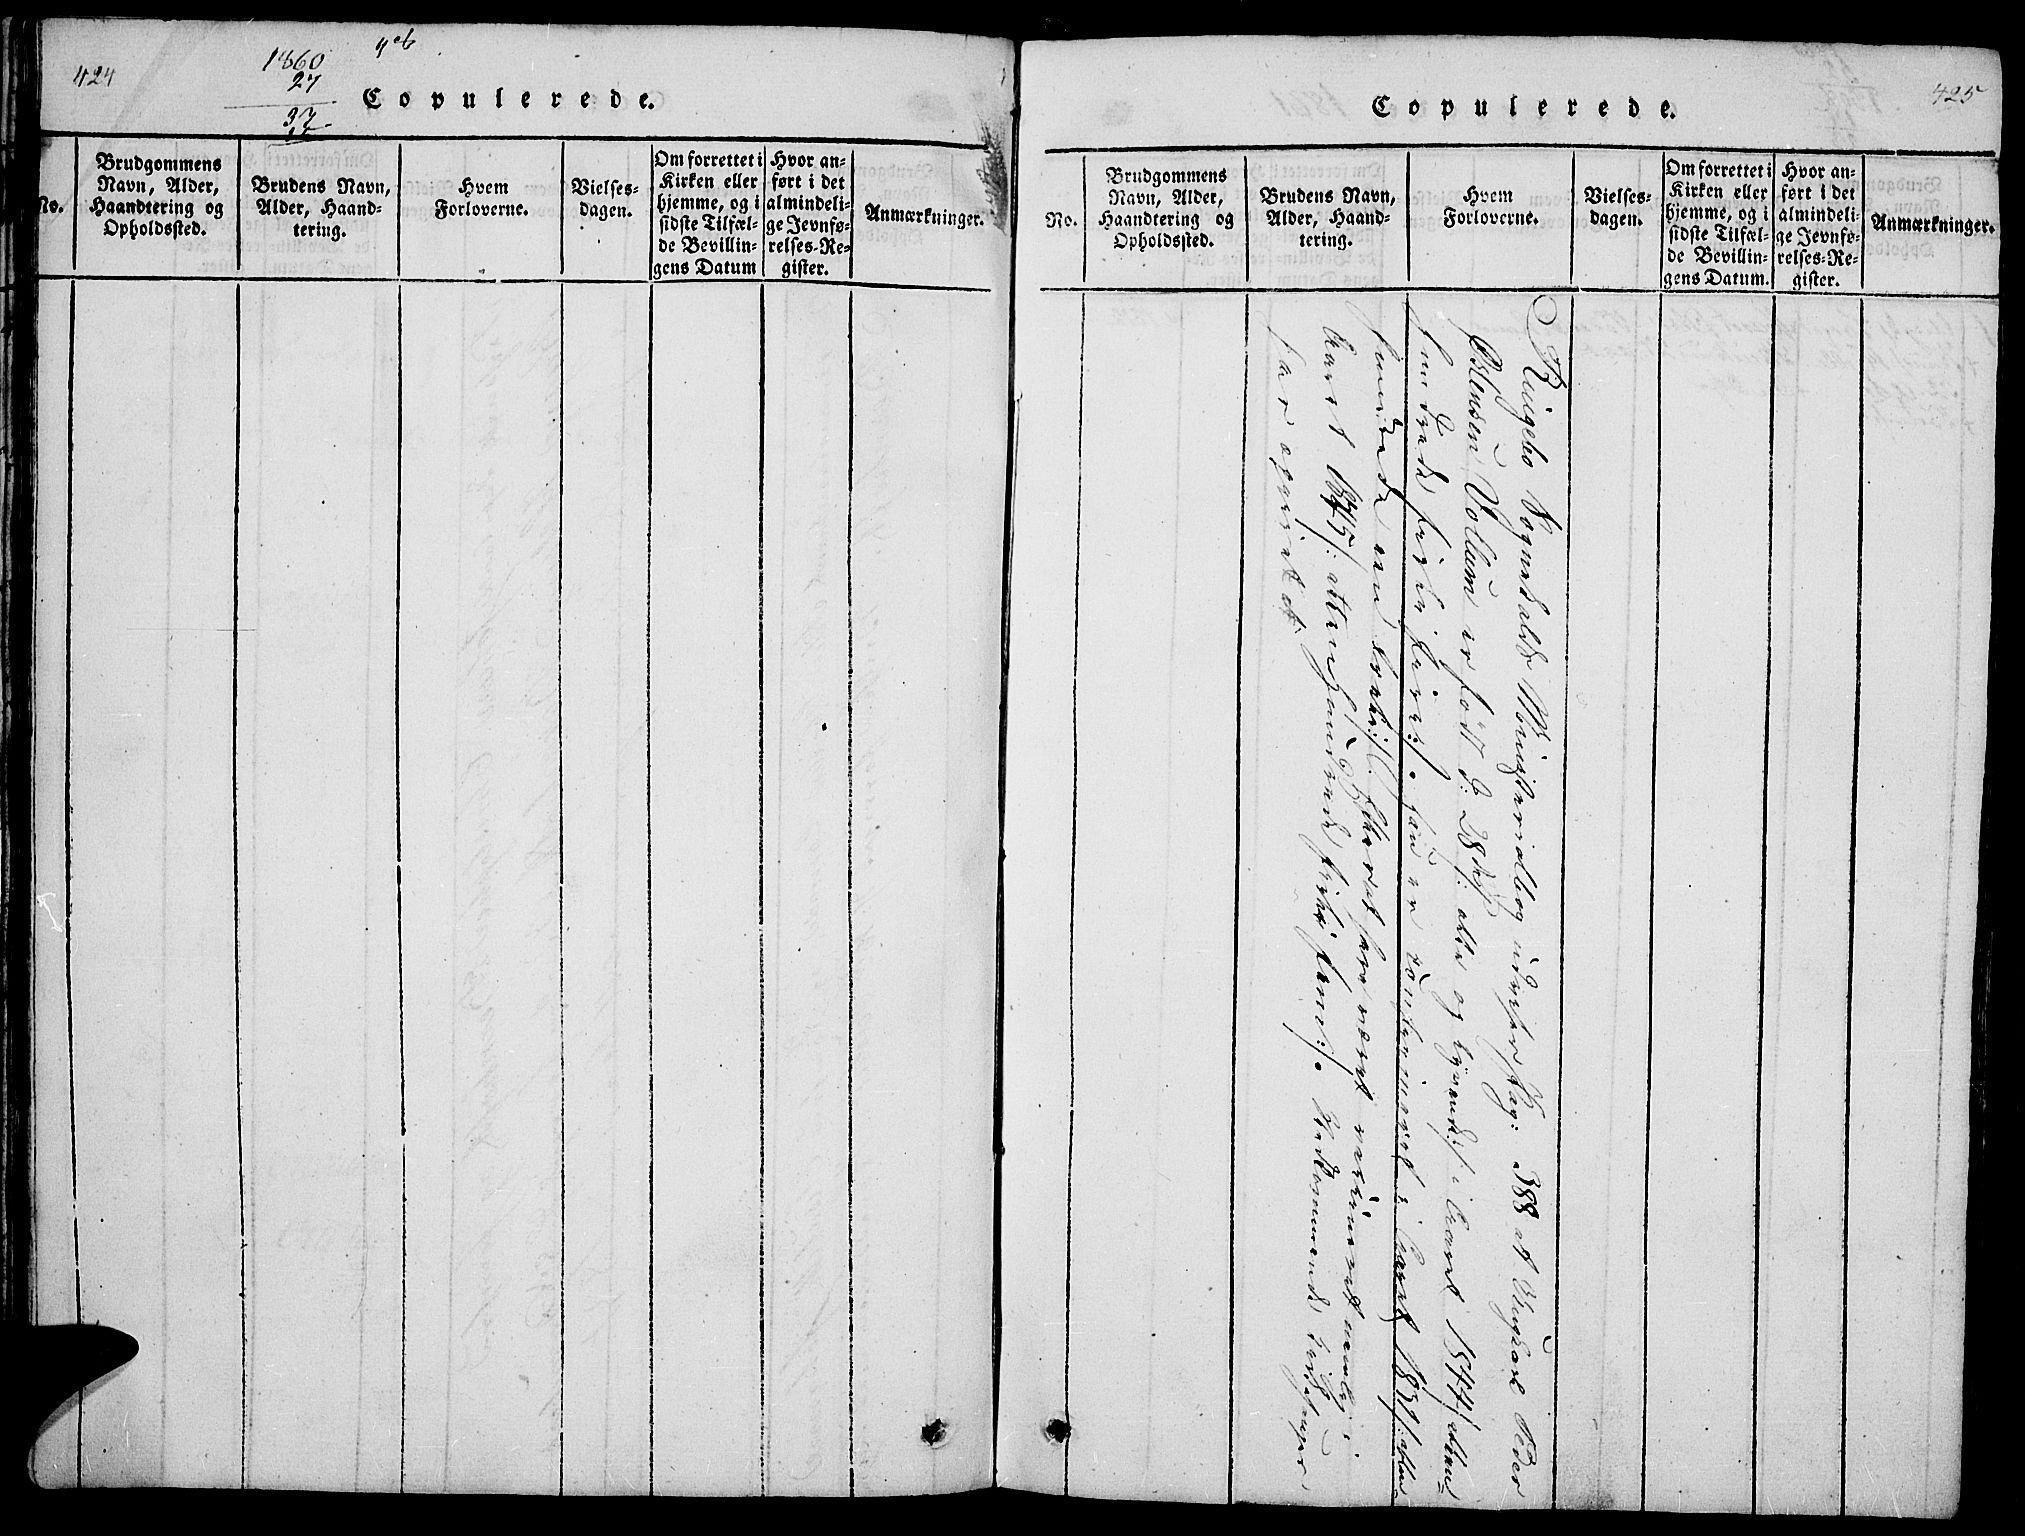 SAH, Ringebu prestekontor, Klokkerbok nr. 1, 1821-1839, s. 424-425